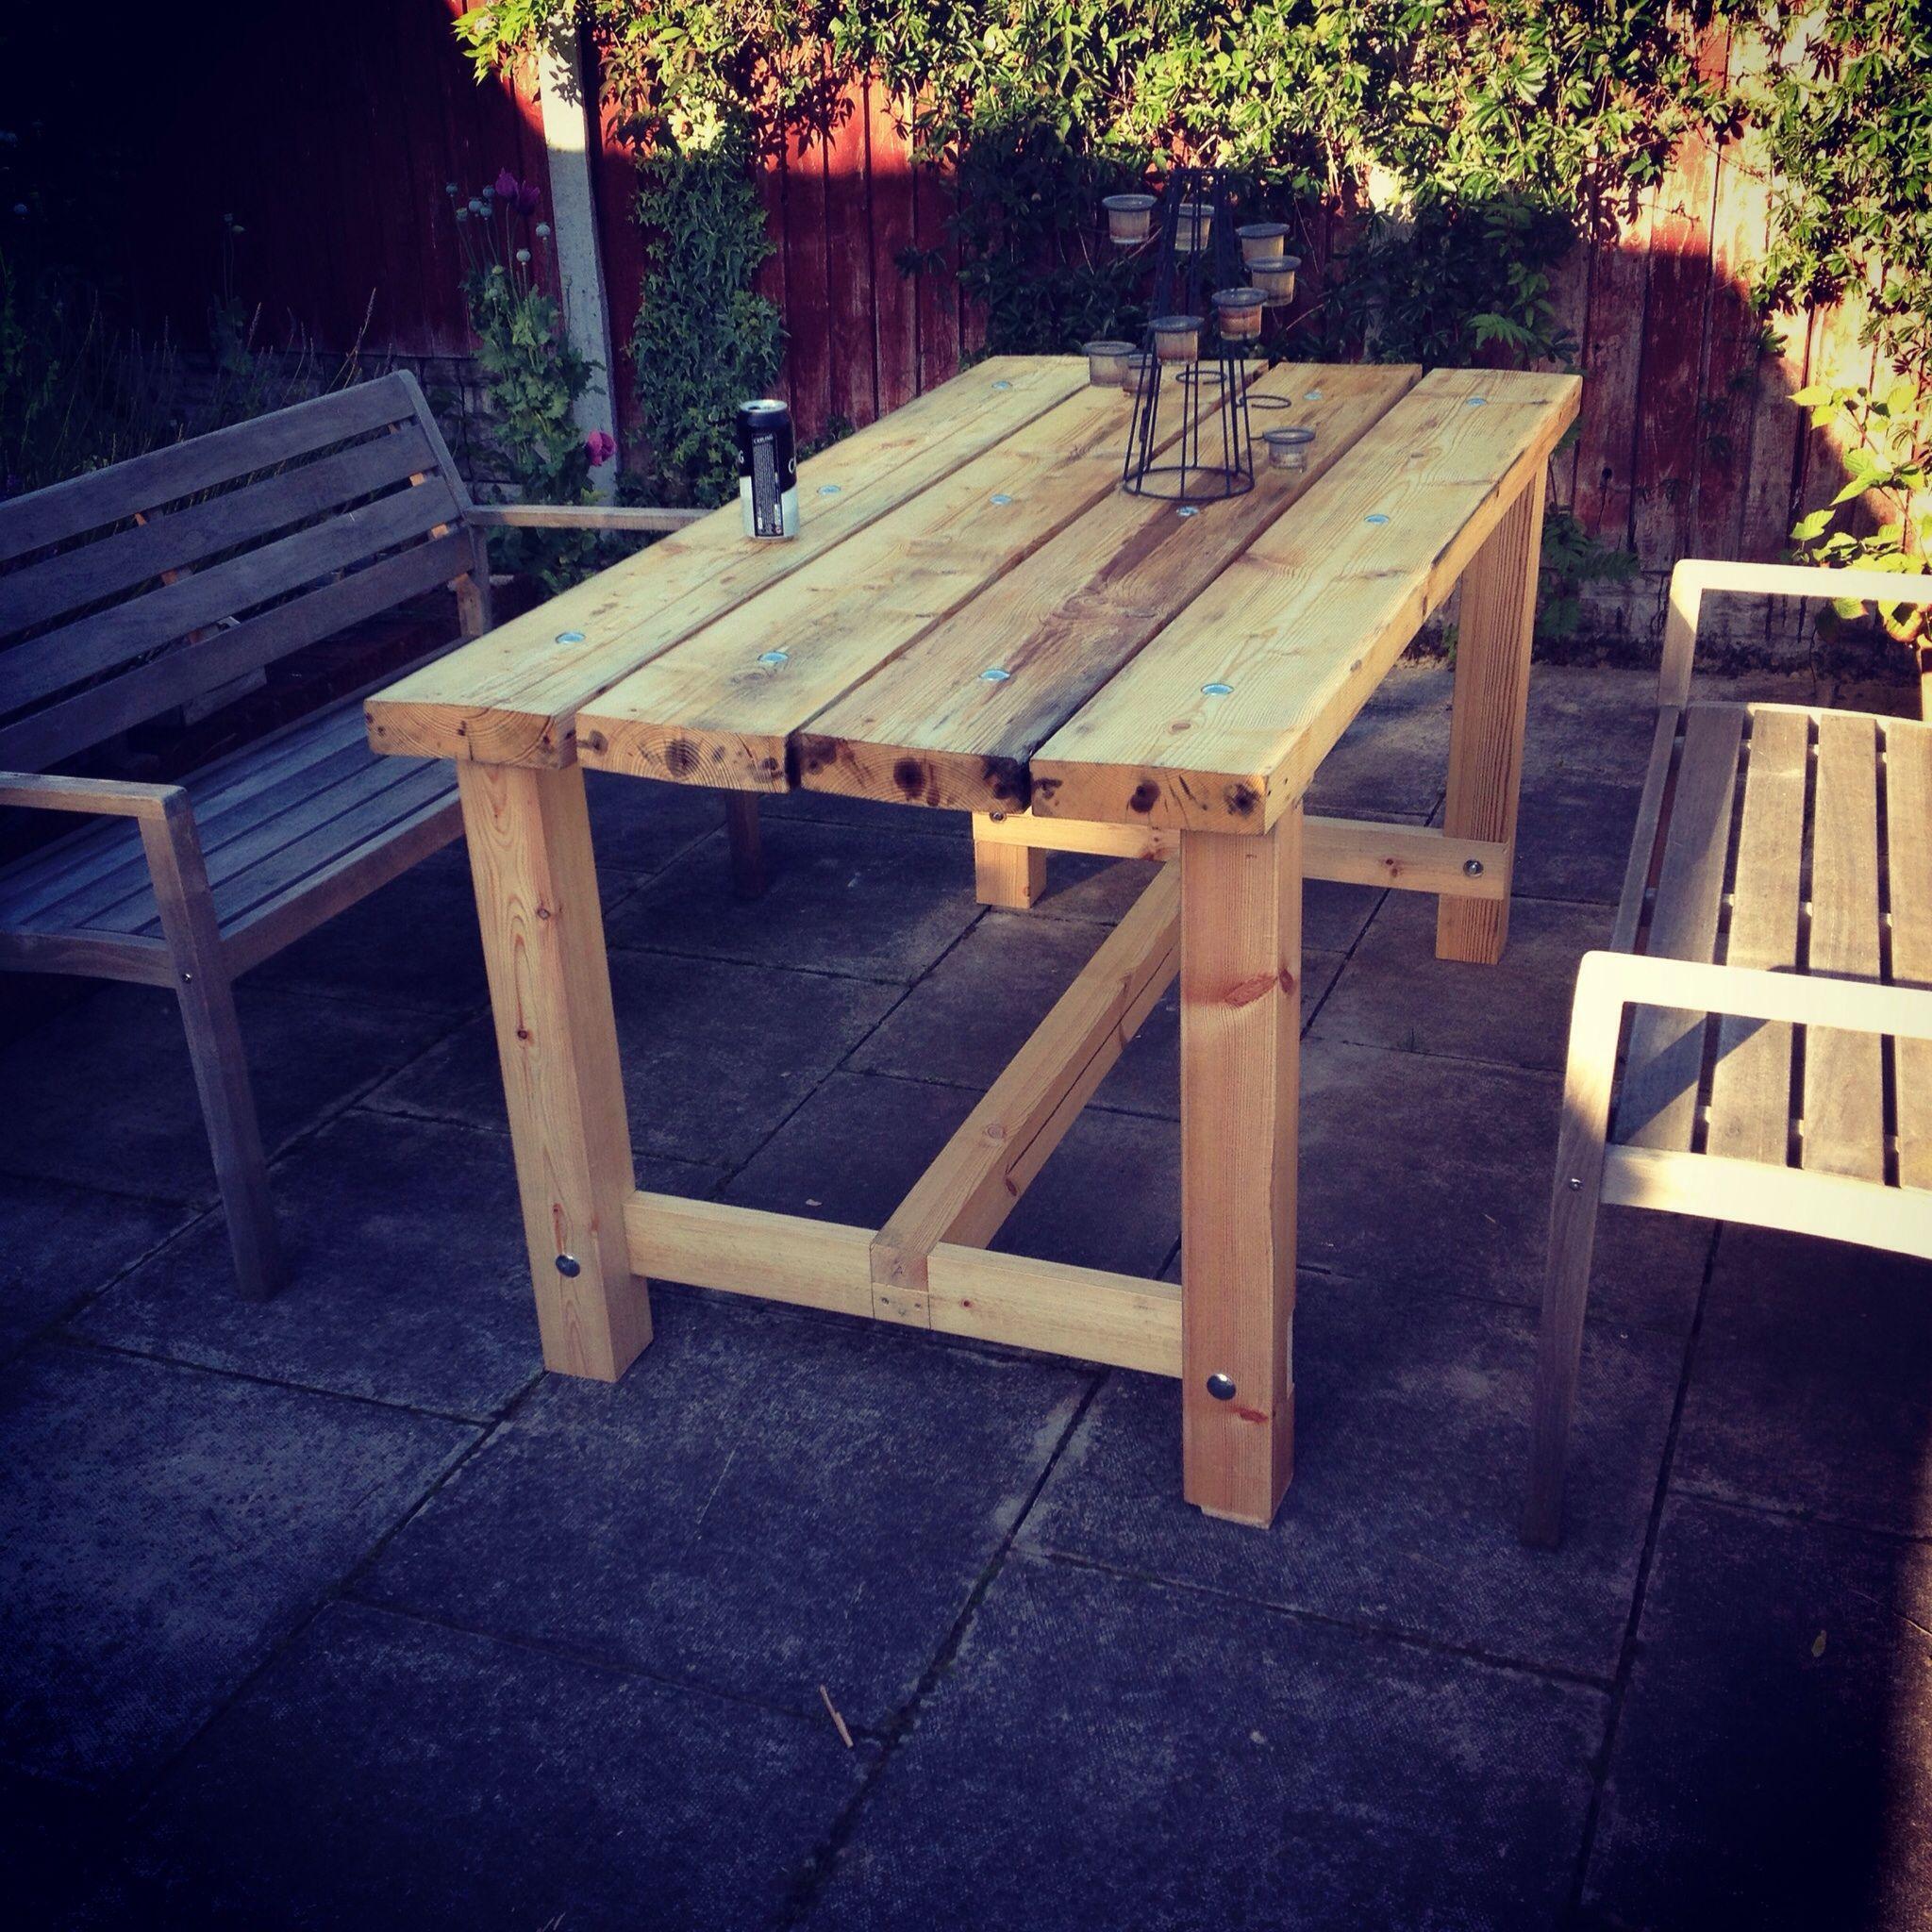 My Scaffold Board Table For The Garden Scaffold Wooden Garden Table Sofa Wood Frame Furniture